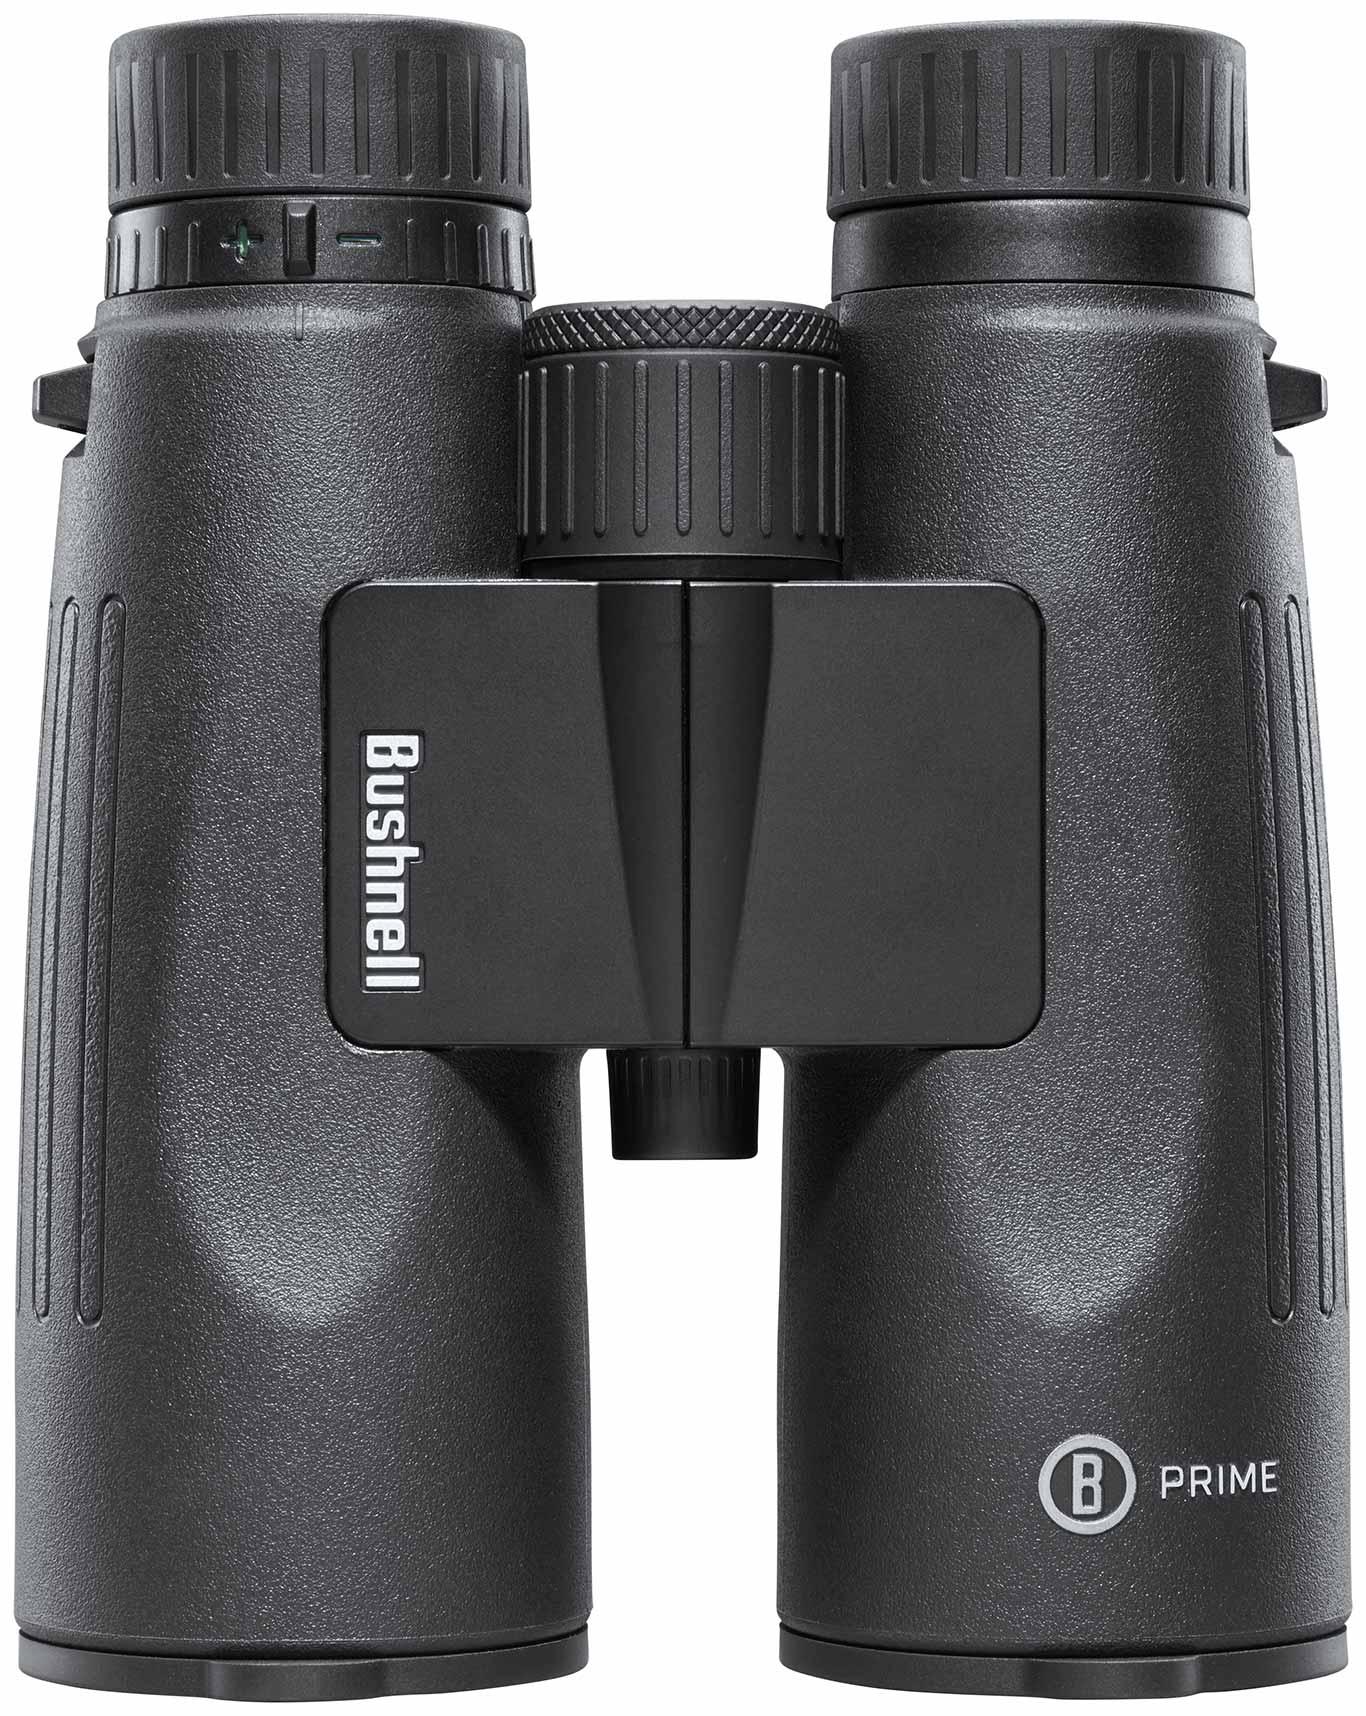 Bushnell Prime Binoculars FDGG